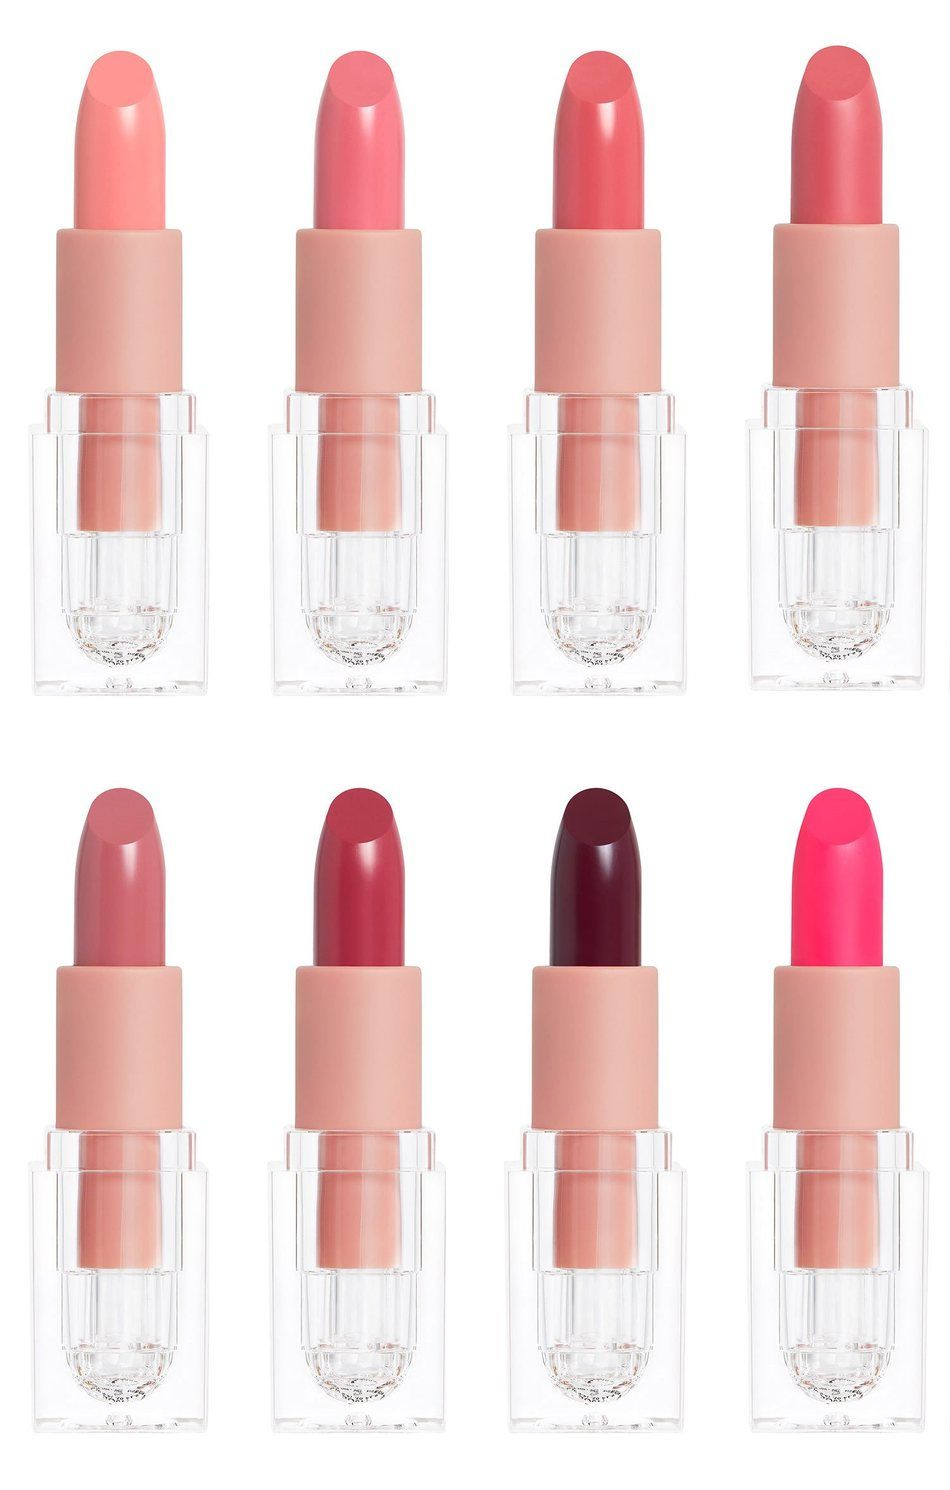 12 Best Spring Lipsticks Spring 2019 Lipstick Colors We Love